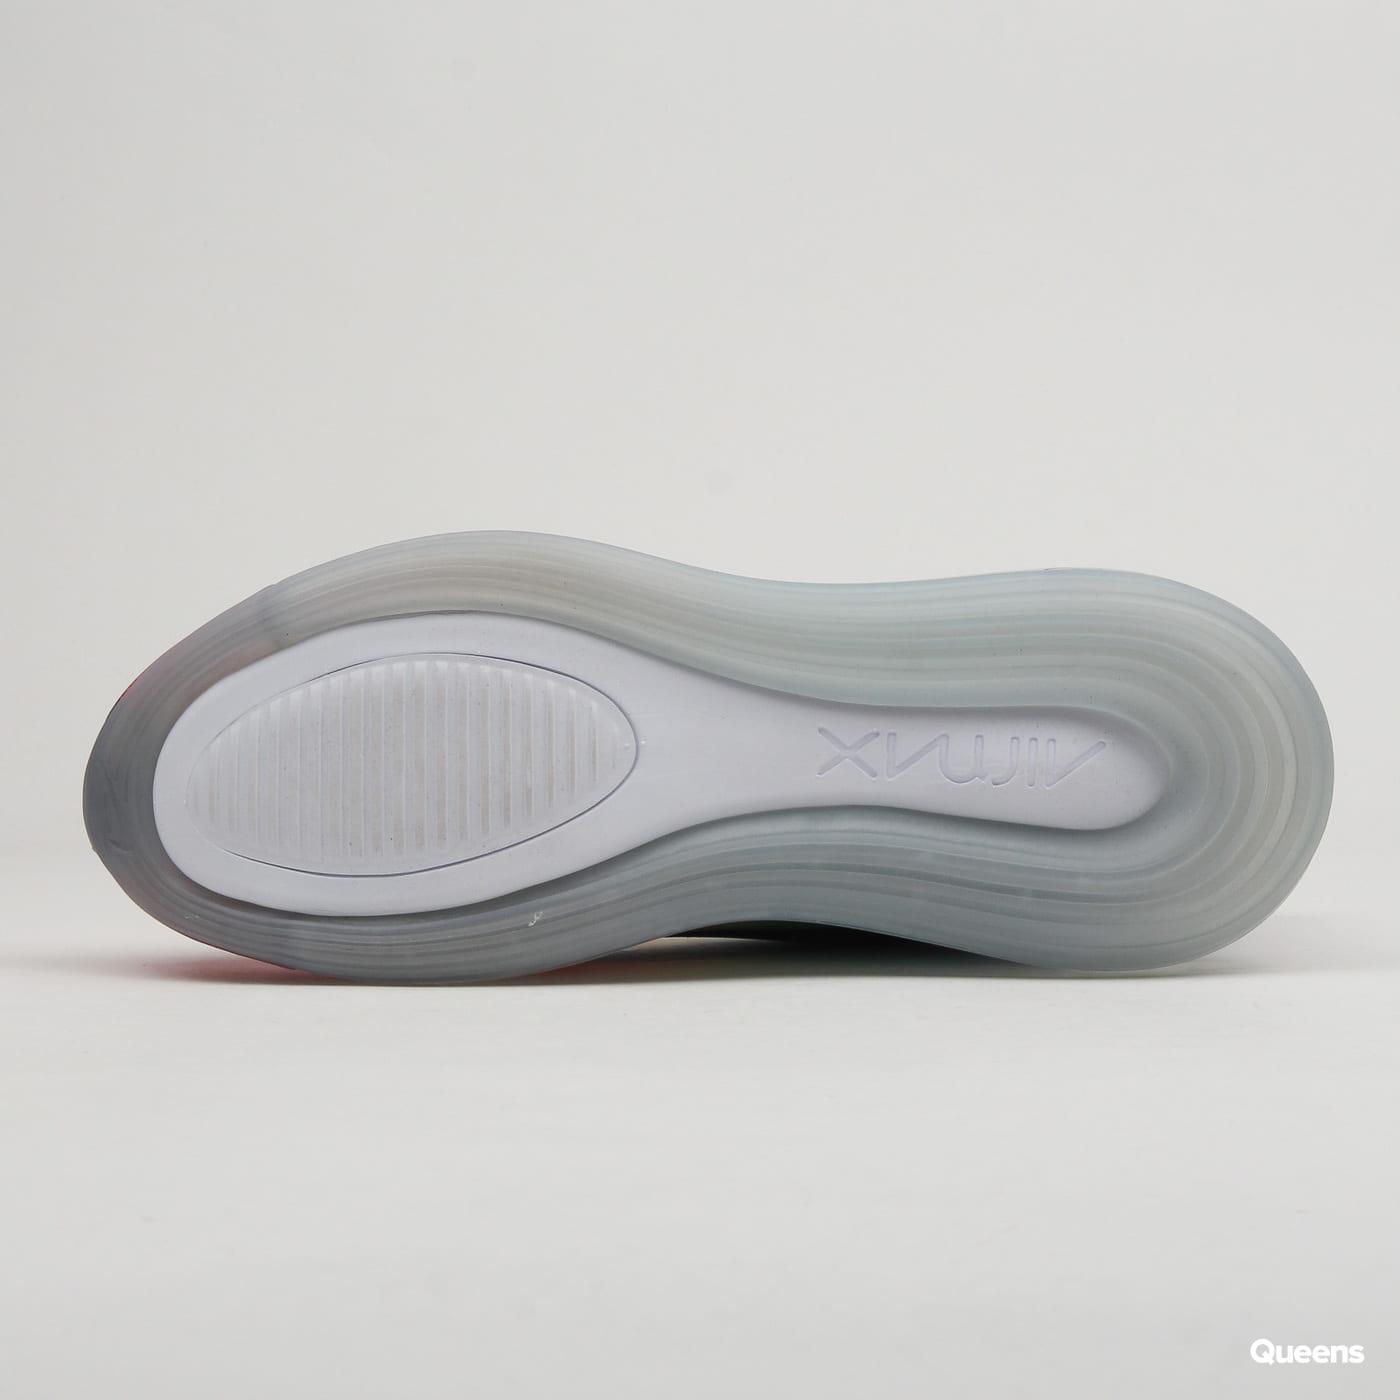 Nike Air Max 720 Betrue multi - color / black - white